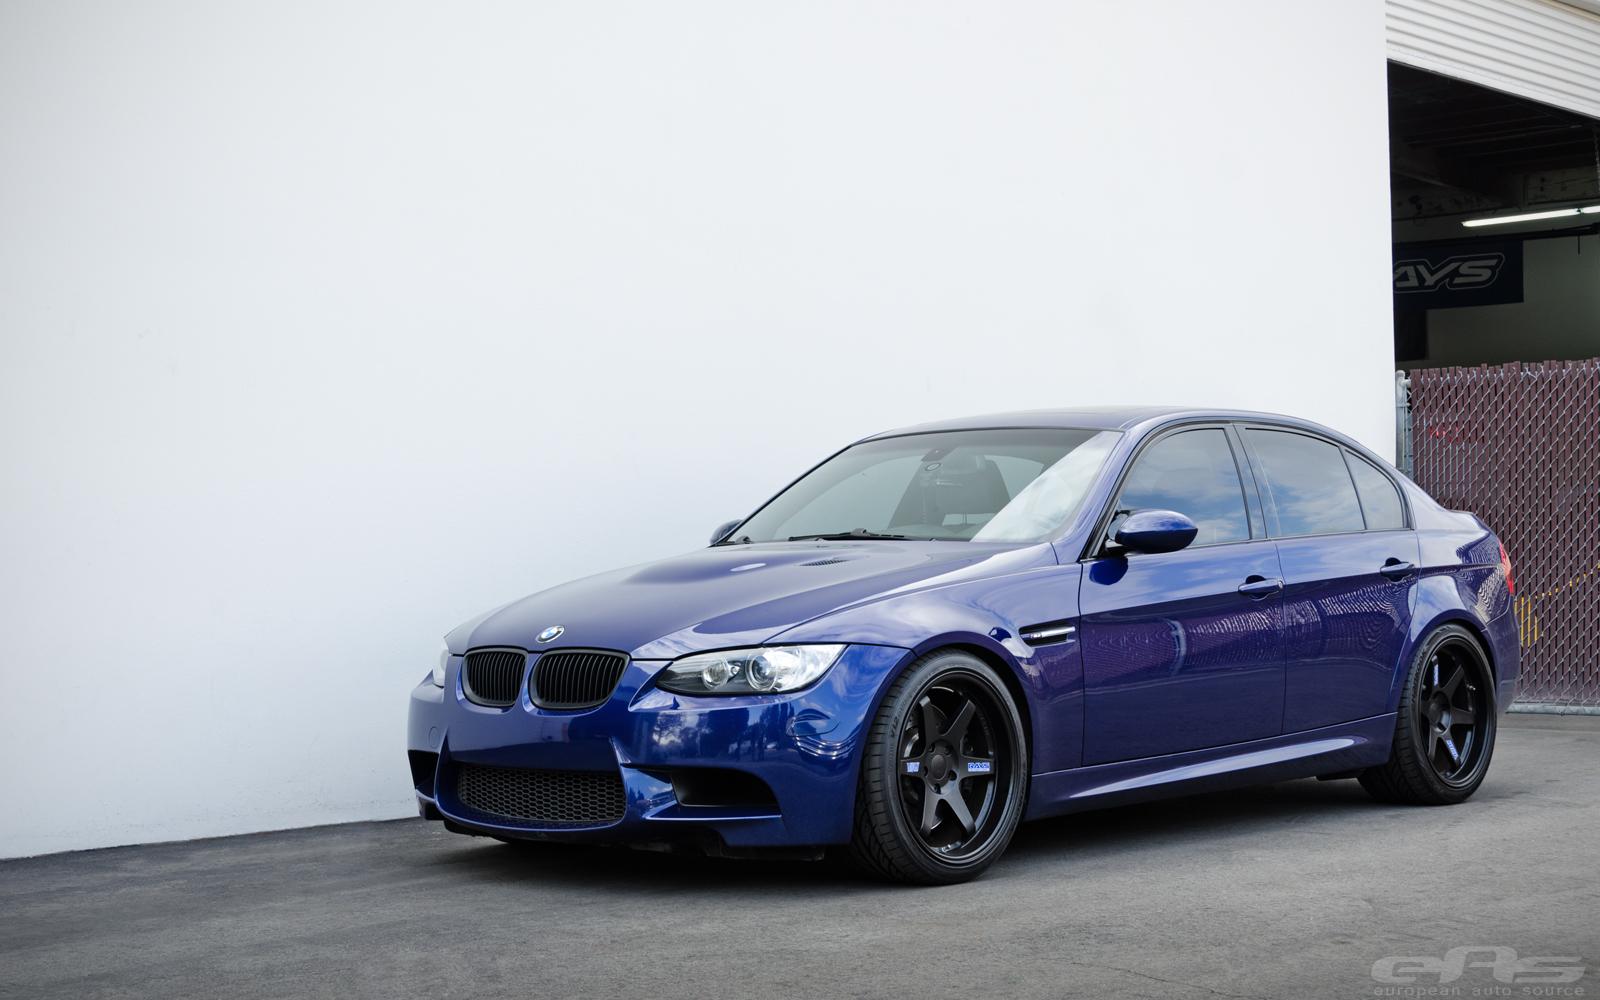 Interlagos Blue E46 M3 >> Interlagos Blue M3 on Black TE37s | BMW Performance Parts & Services